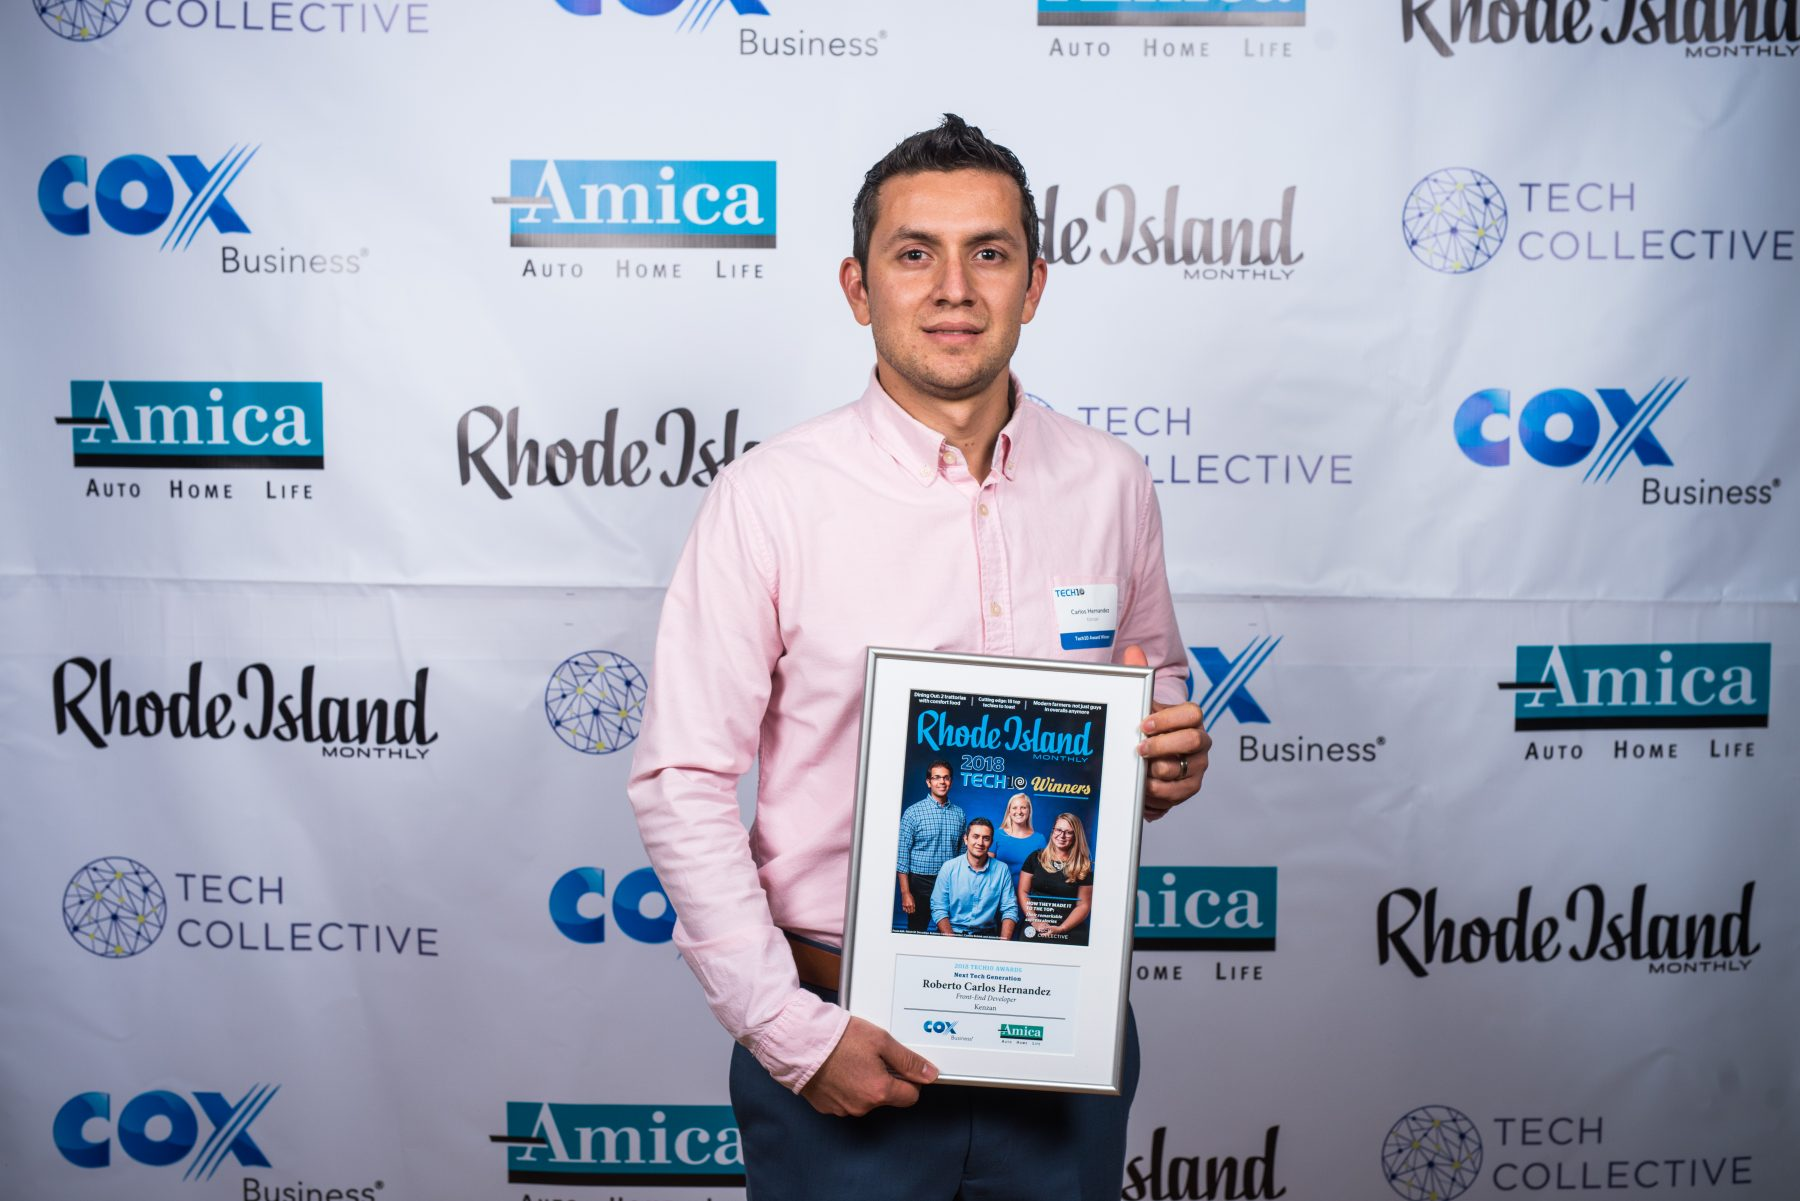 Rhode Island Monthly Tech10 Awards Roger Williams Casino Blueflash Photography 11